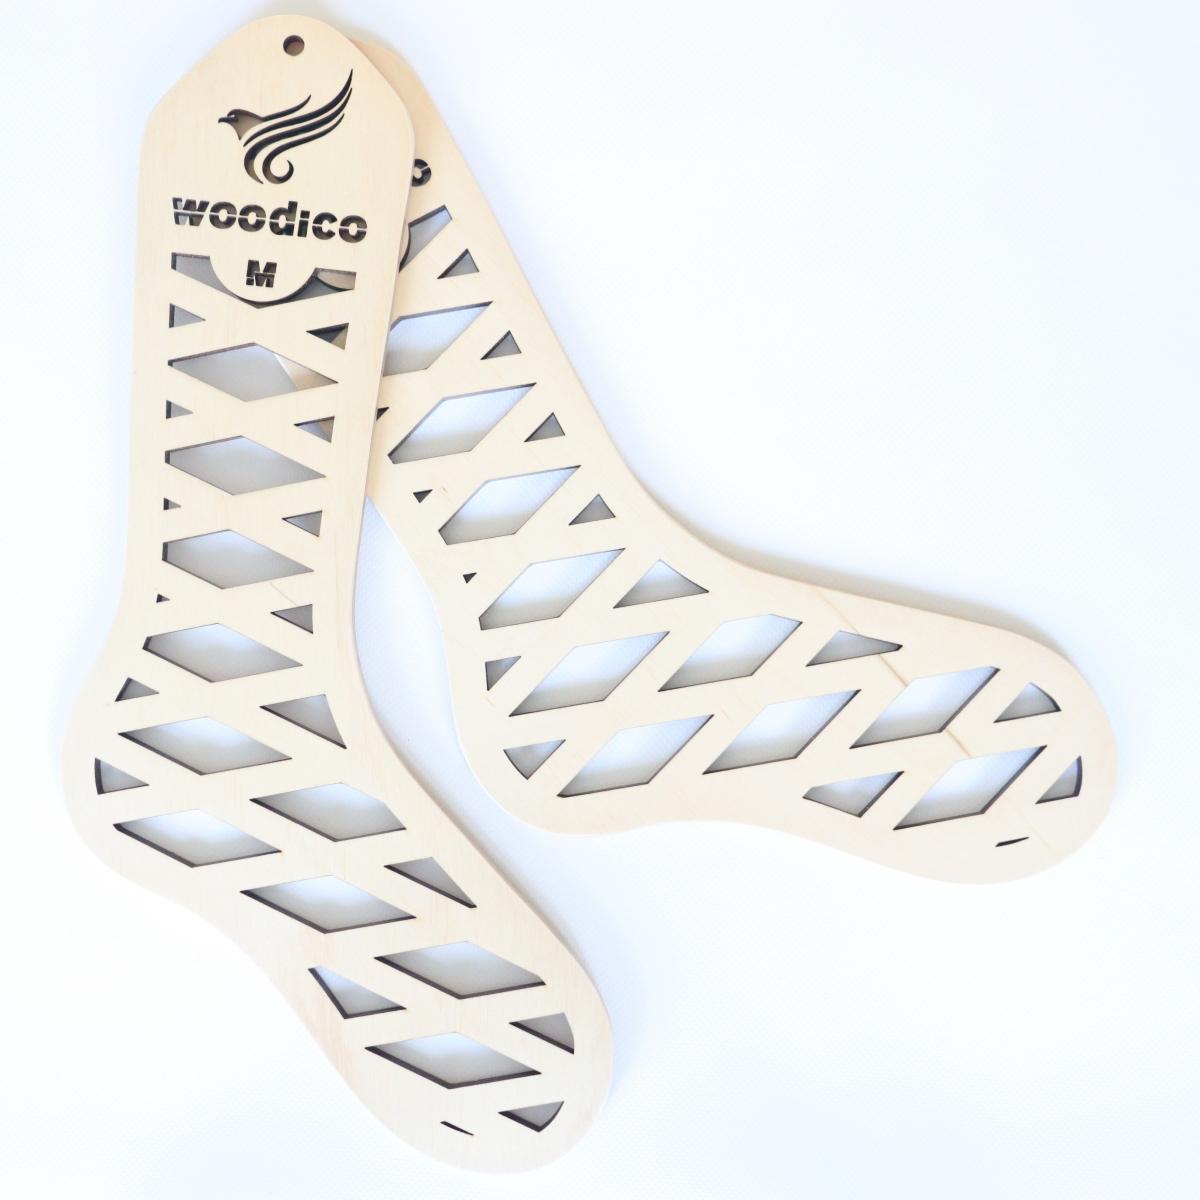 woodico.pro wooden sock blockers aquila 29 1200x1200 - Wooden sock blockers / Aquila